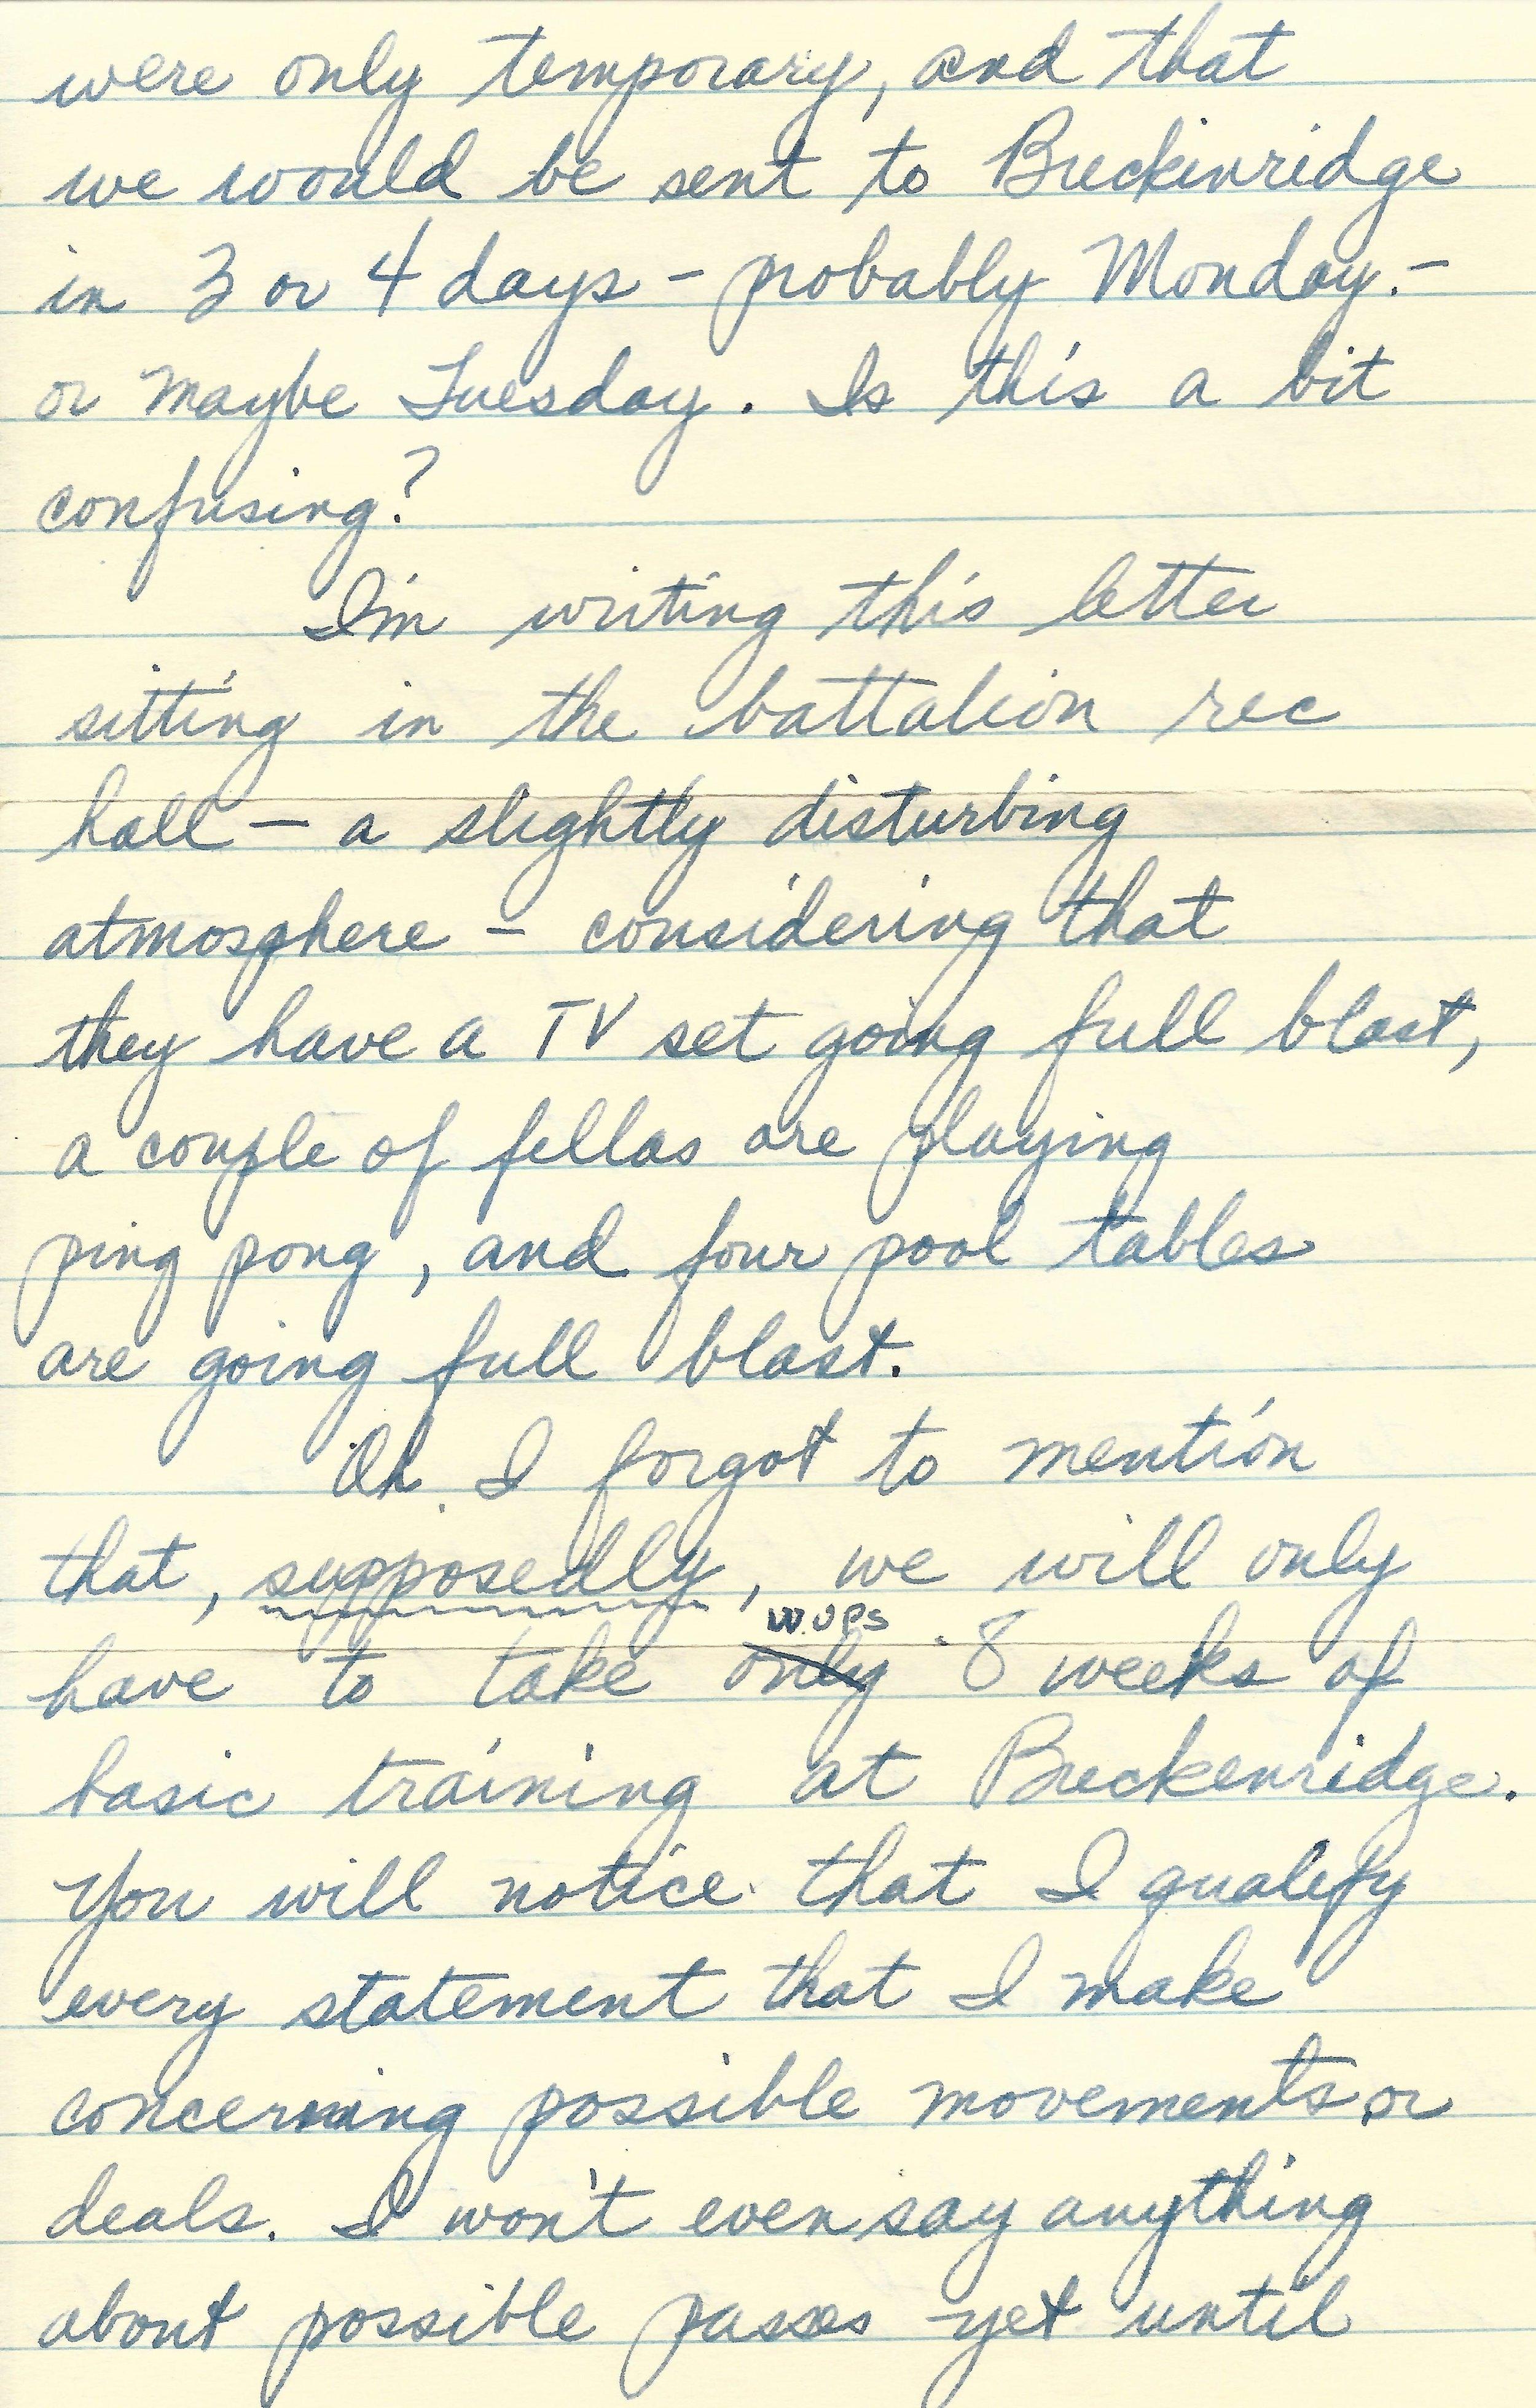 4. Oct. 10, 1952 (Opa)_Page_3.jpg